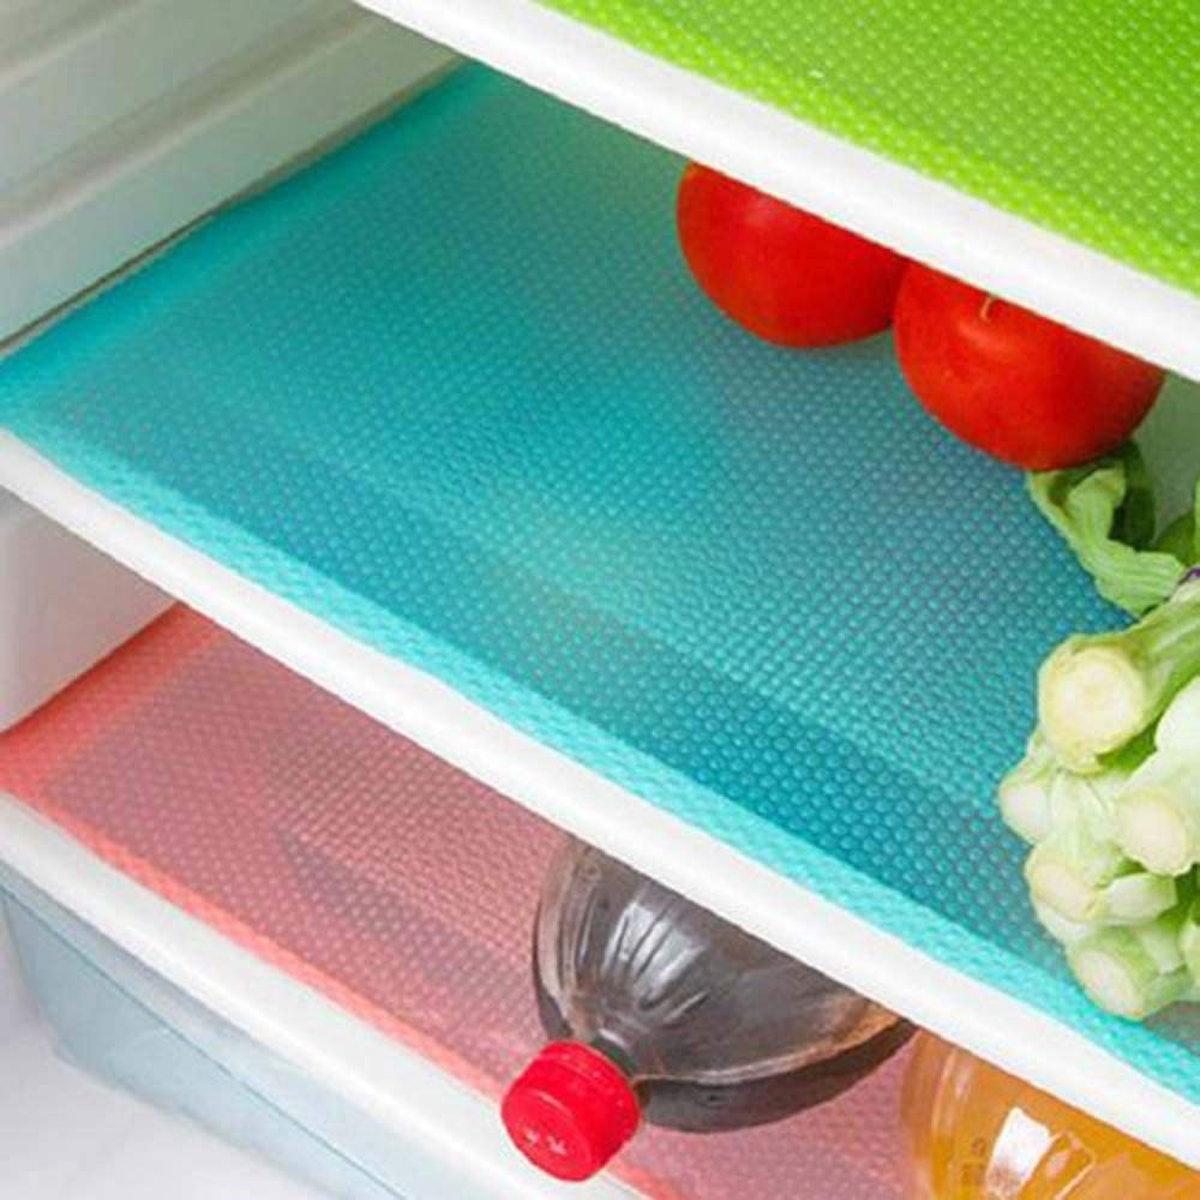 OJYUDD Refrigerator Shelf Liners (6 Pack)